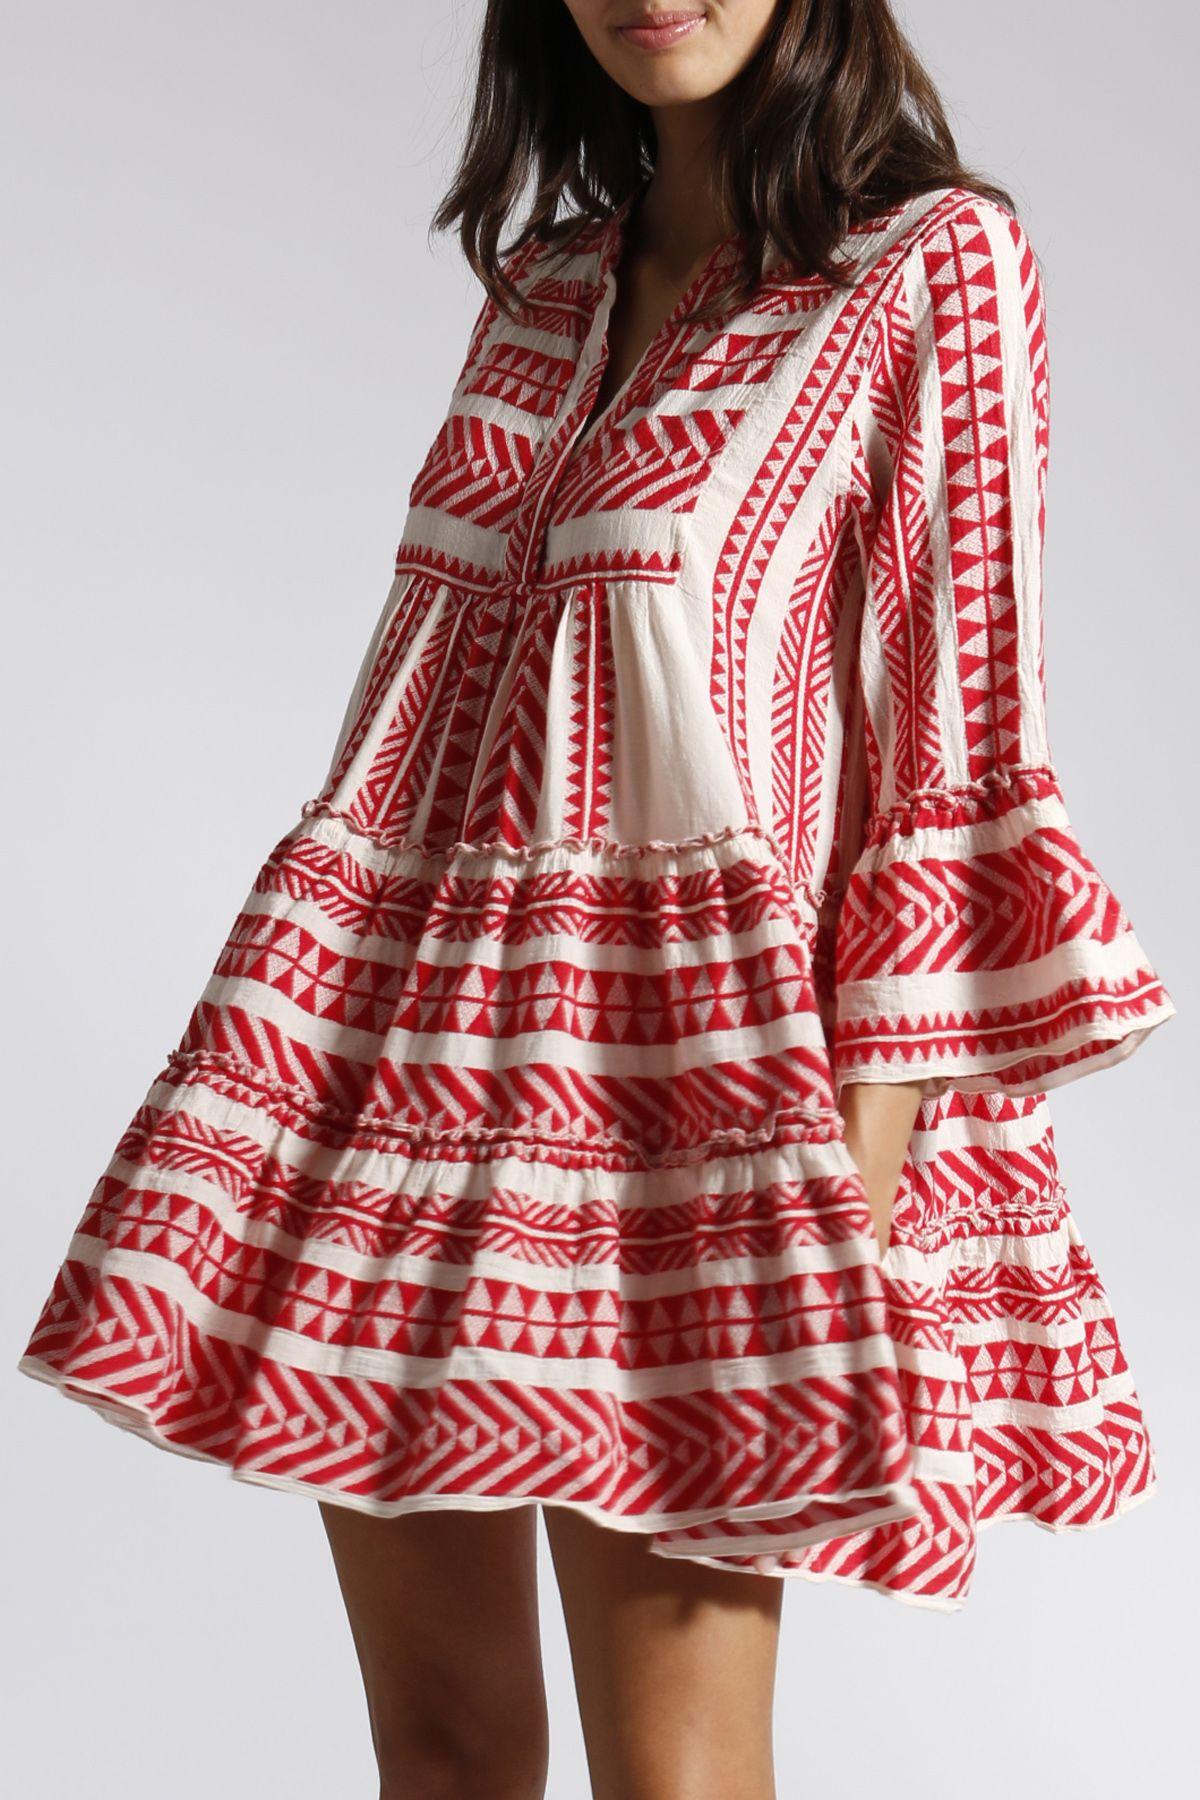 Gemustertes Tunikakleid Aus Baumwolle Rot Weiss In 2020 Tunika Kleid Langarmliges Kleid Kleider